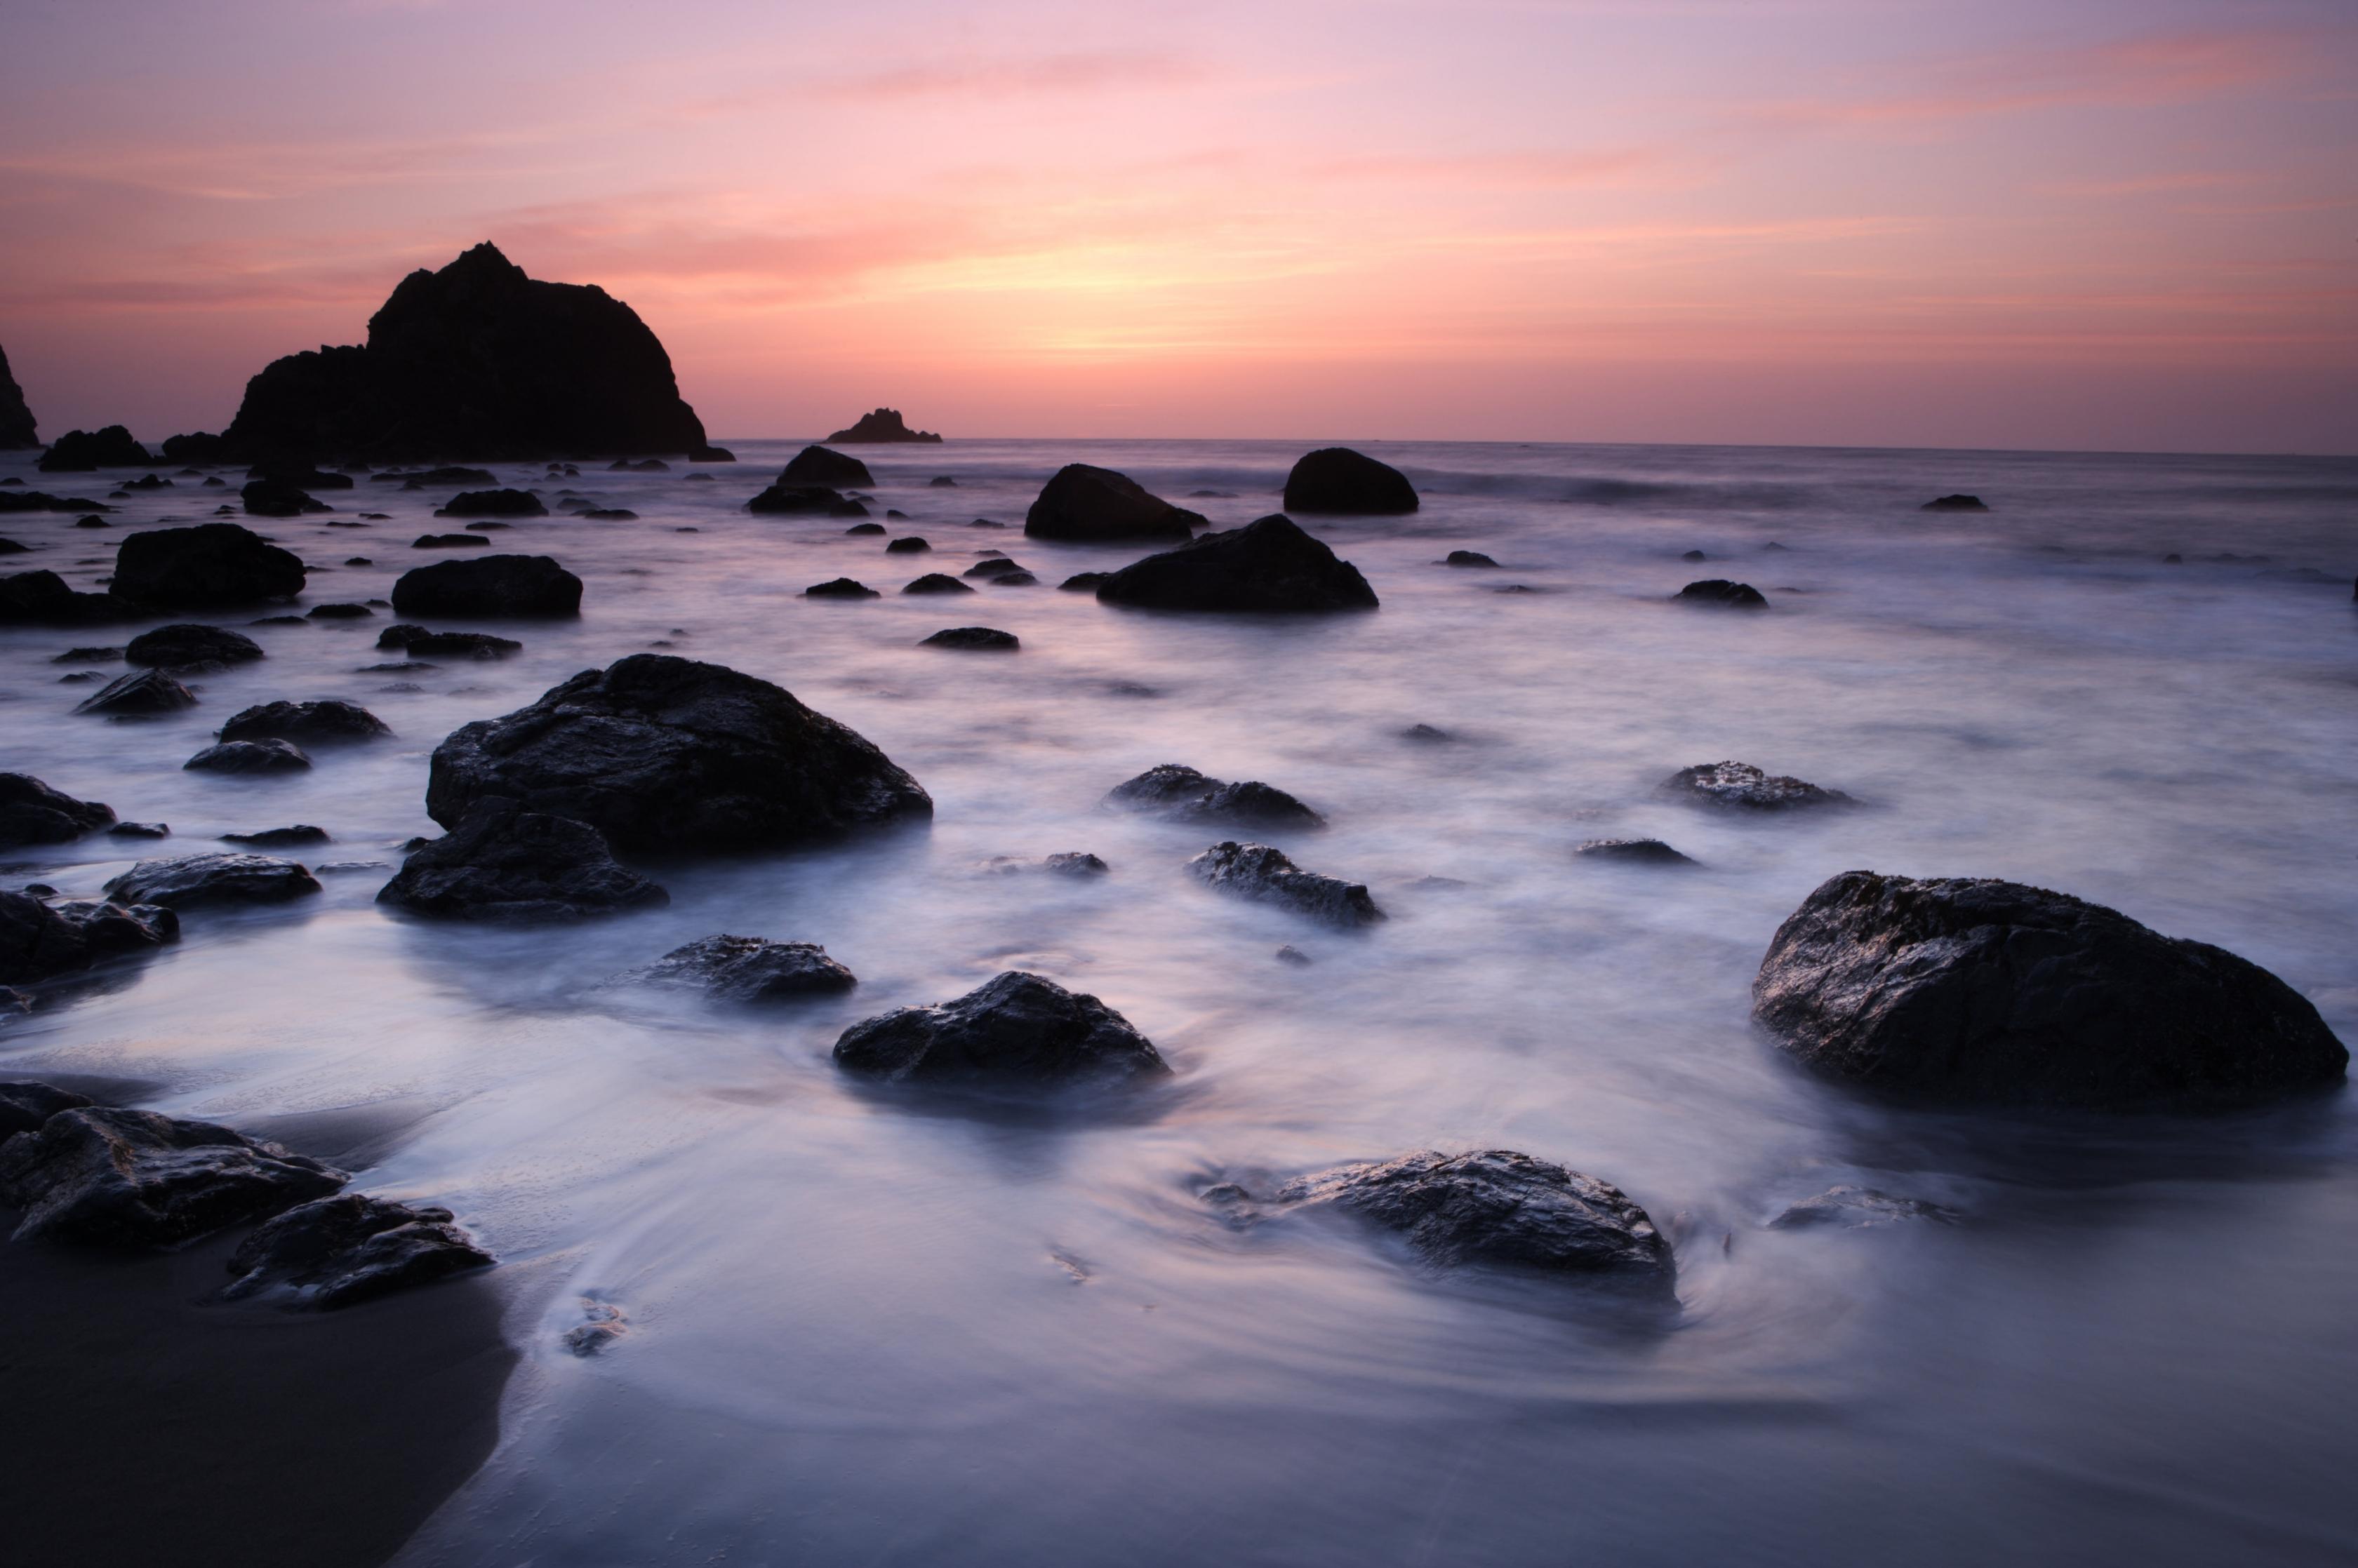 Point Reyes at sunset.